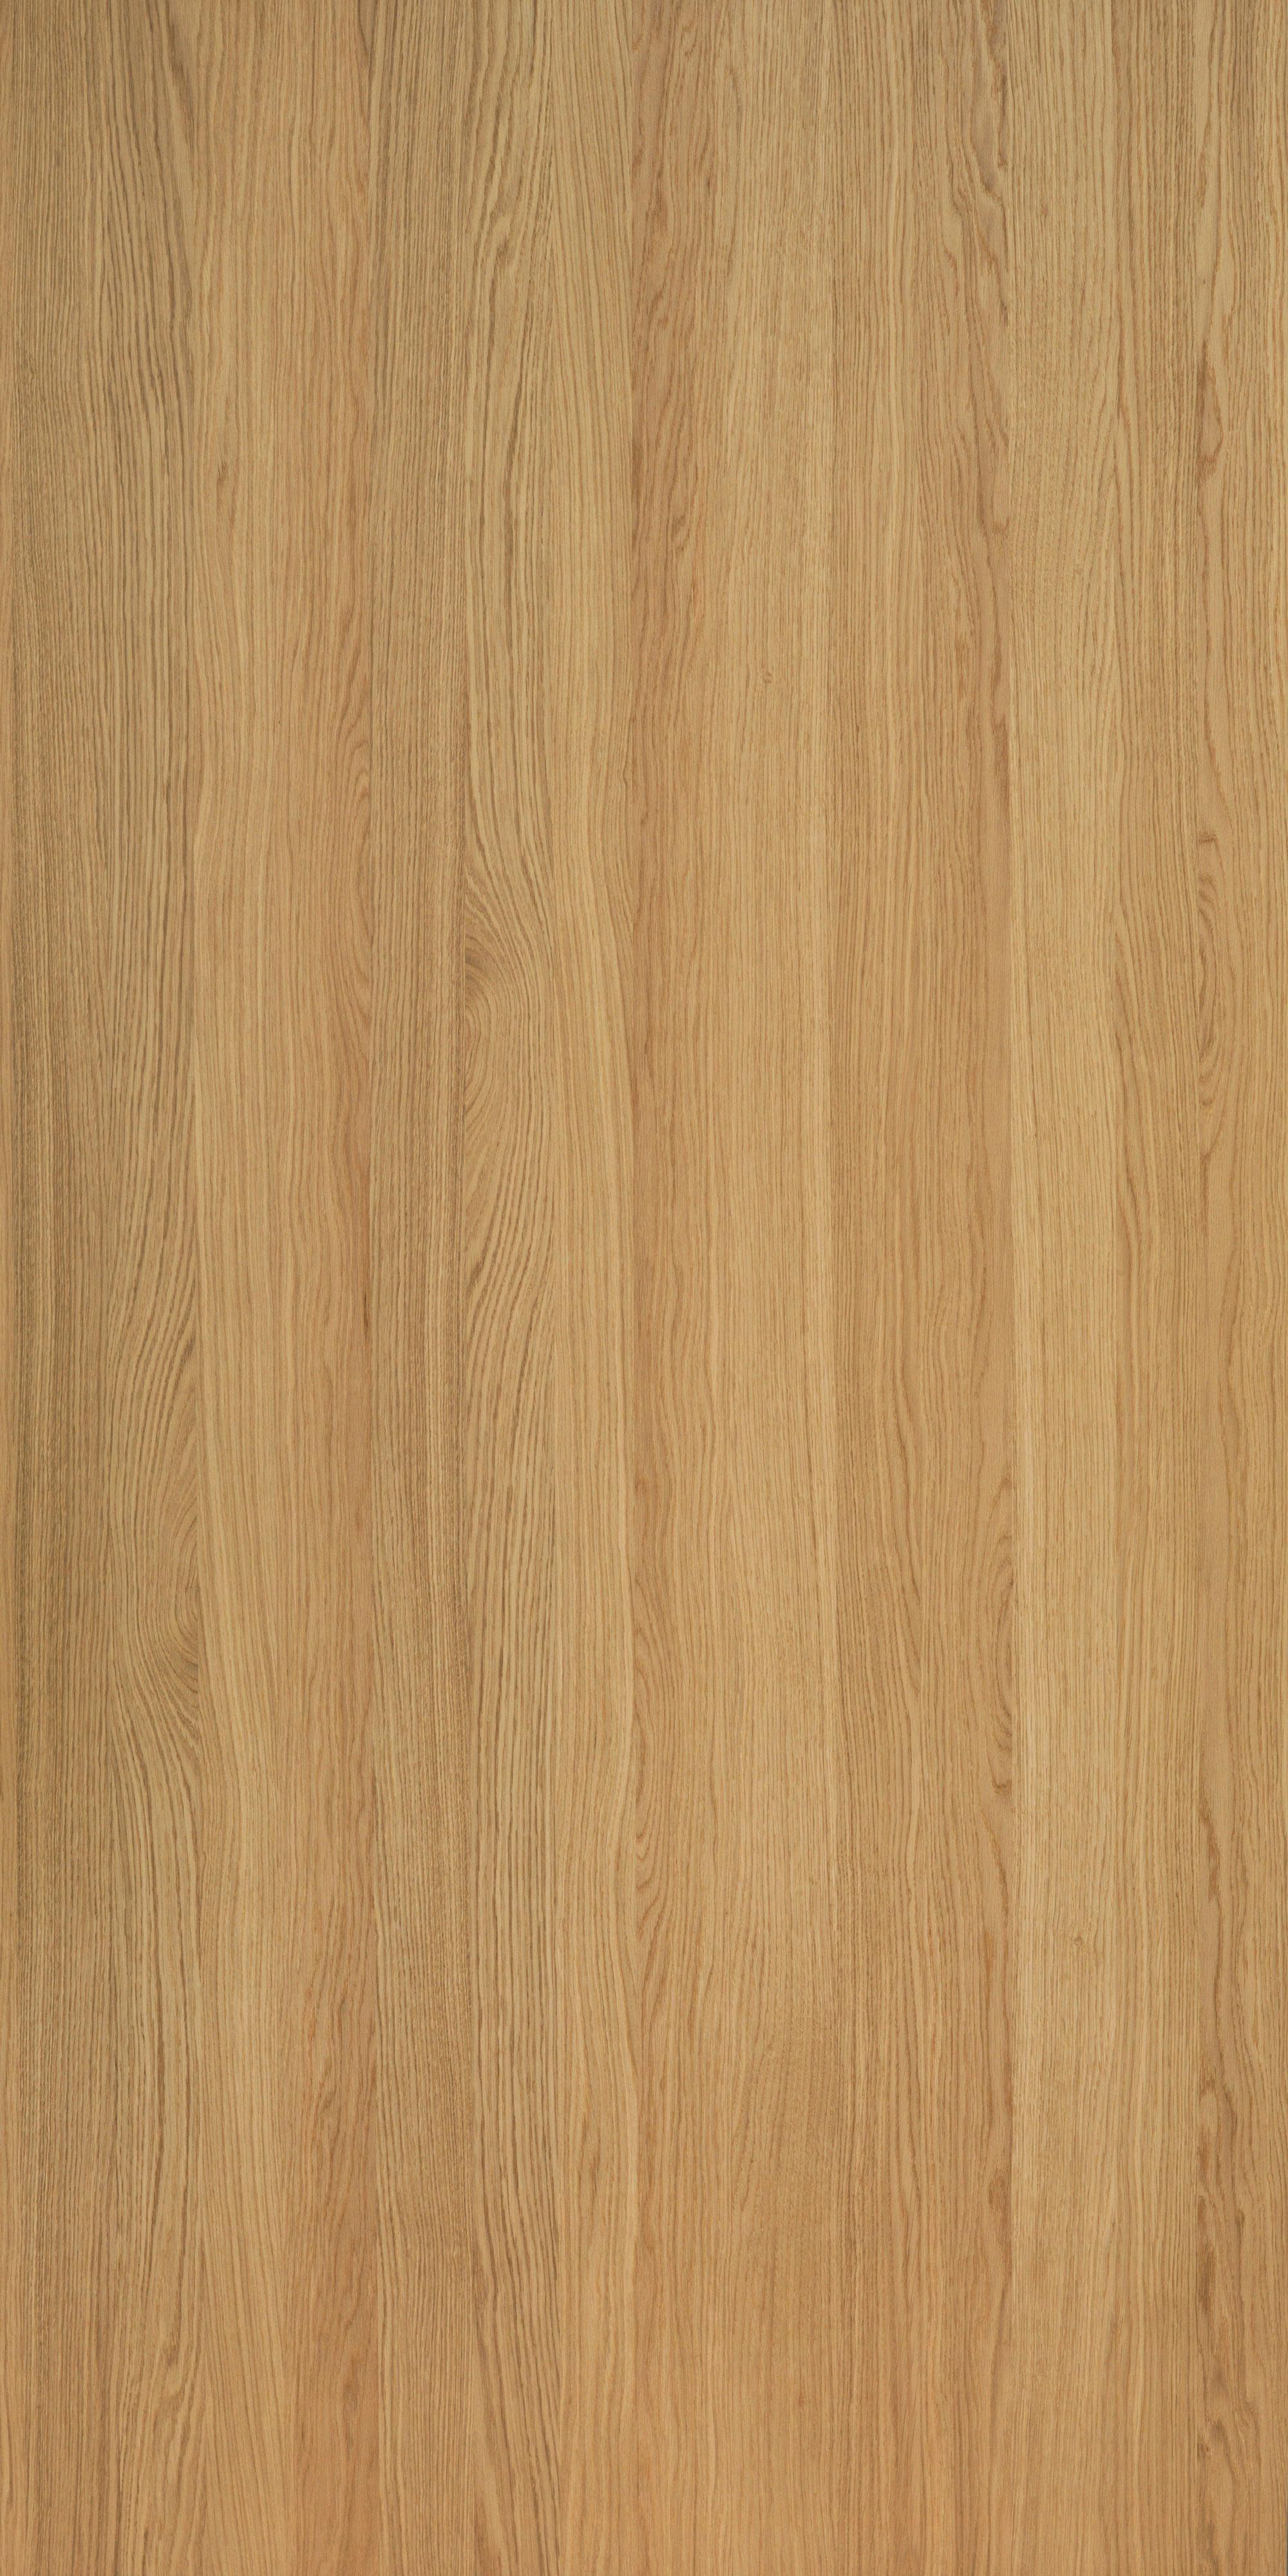 oak natural querkus by decospan. Black Bedroom Furniture Sets. Home Design Ideas